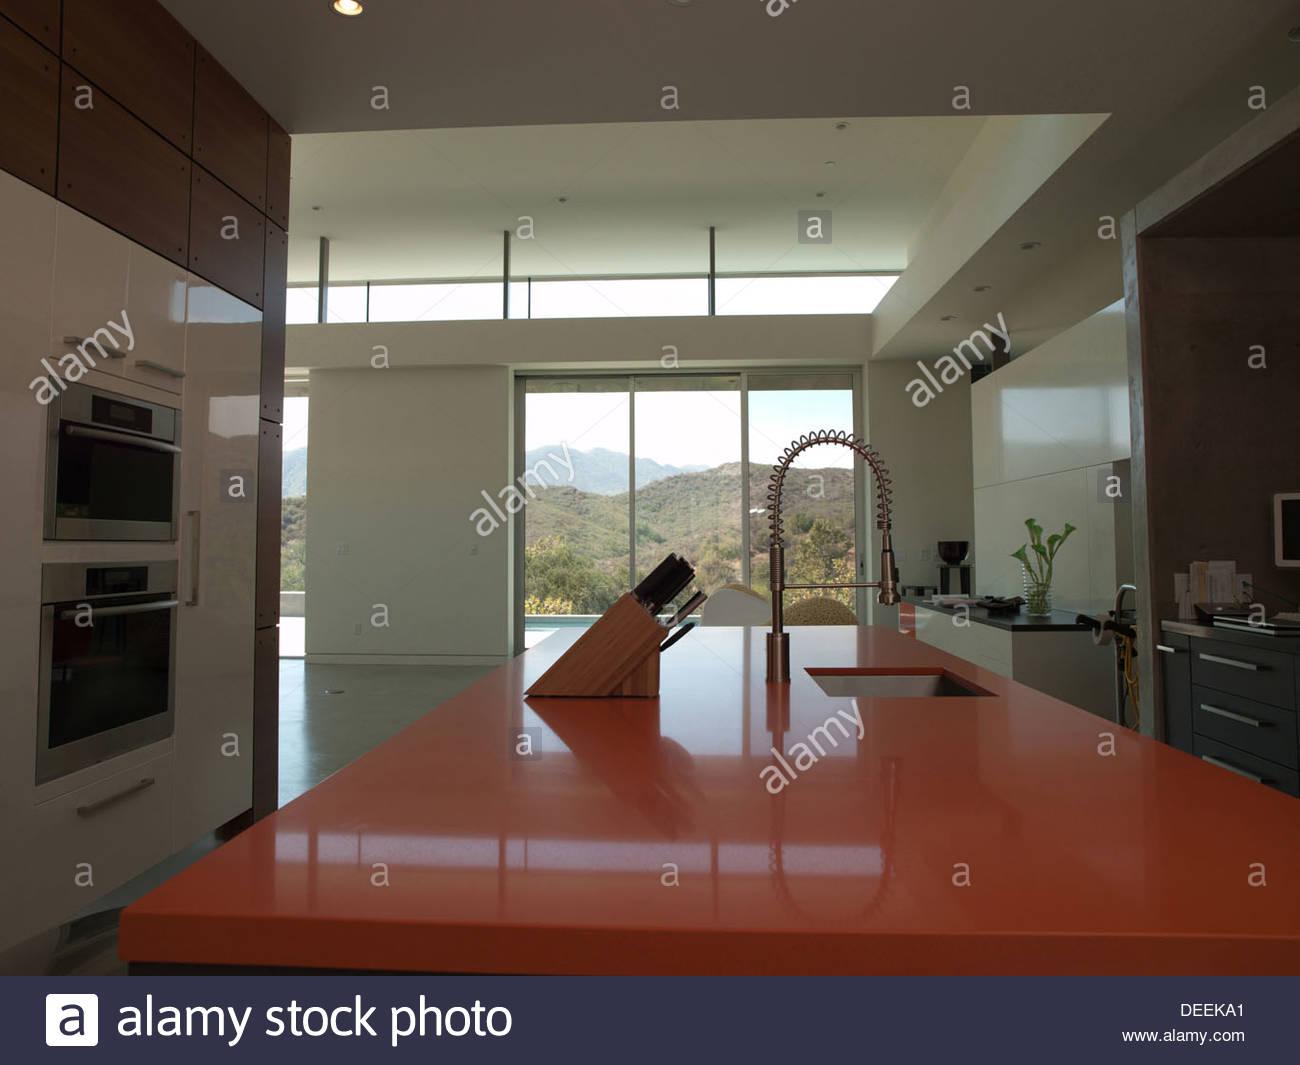 Interior of modern kitchen - Stock Image